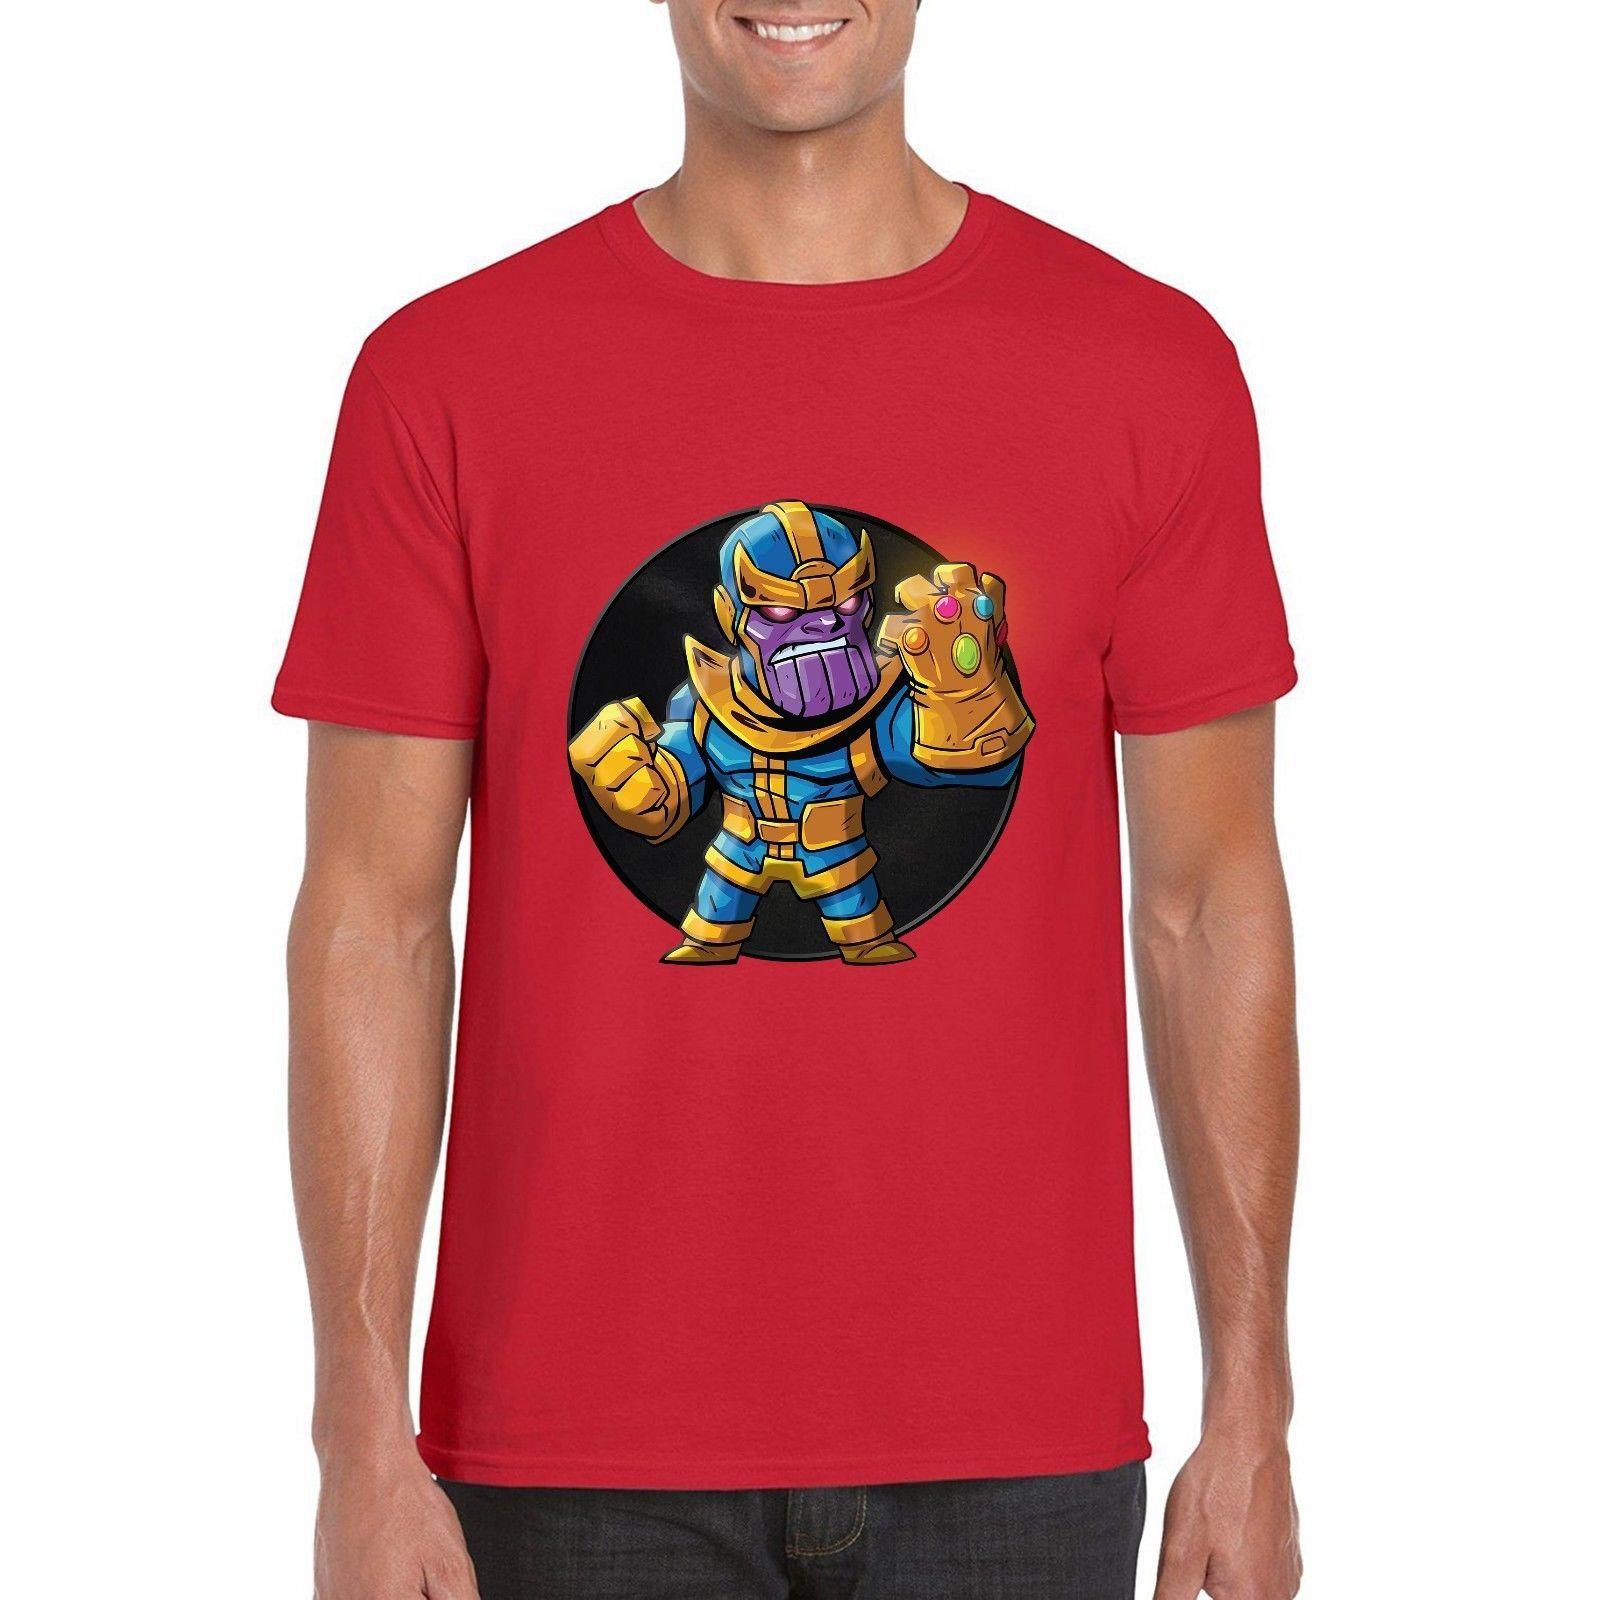 WarMarvel Infinity Inspired Design Thanos Acquista Maglietta Comic 3Lc4RAj5q